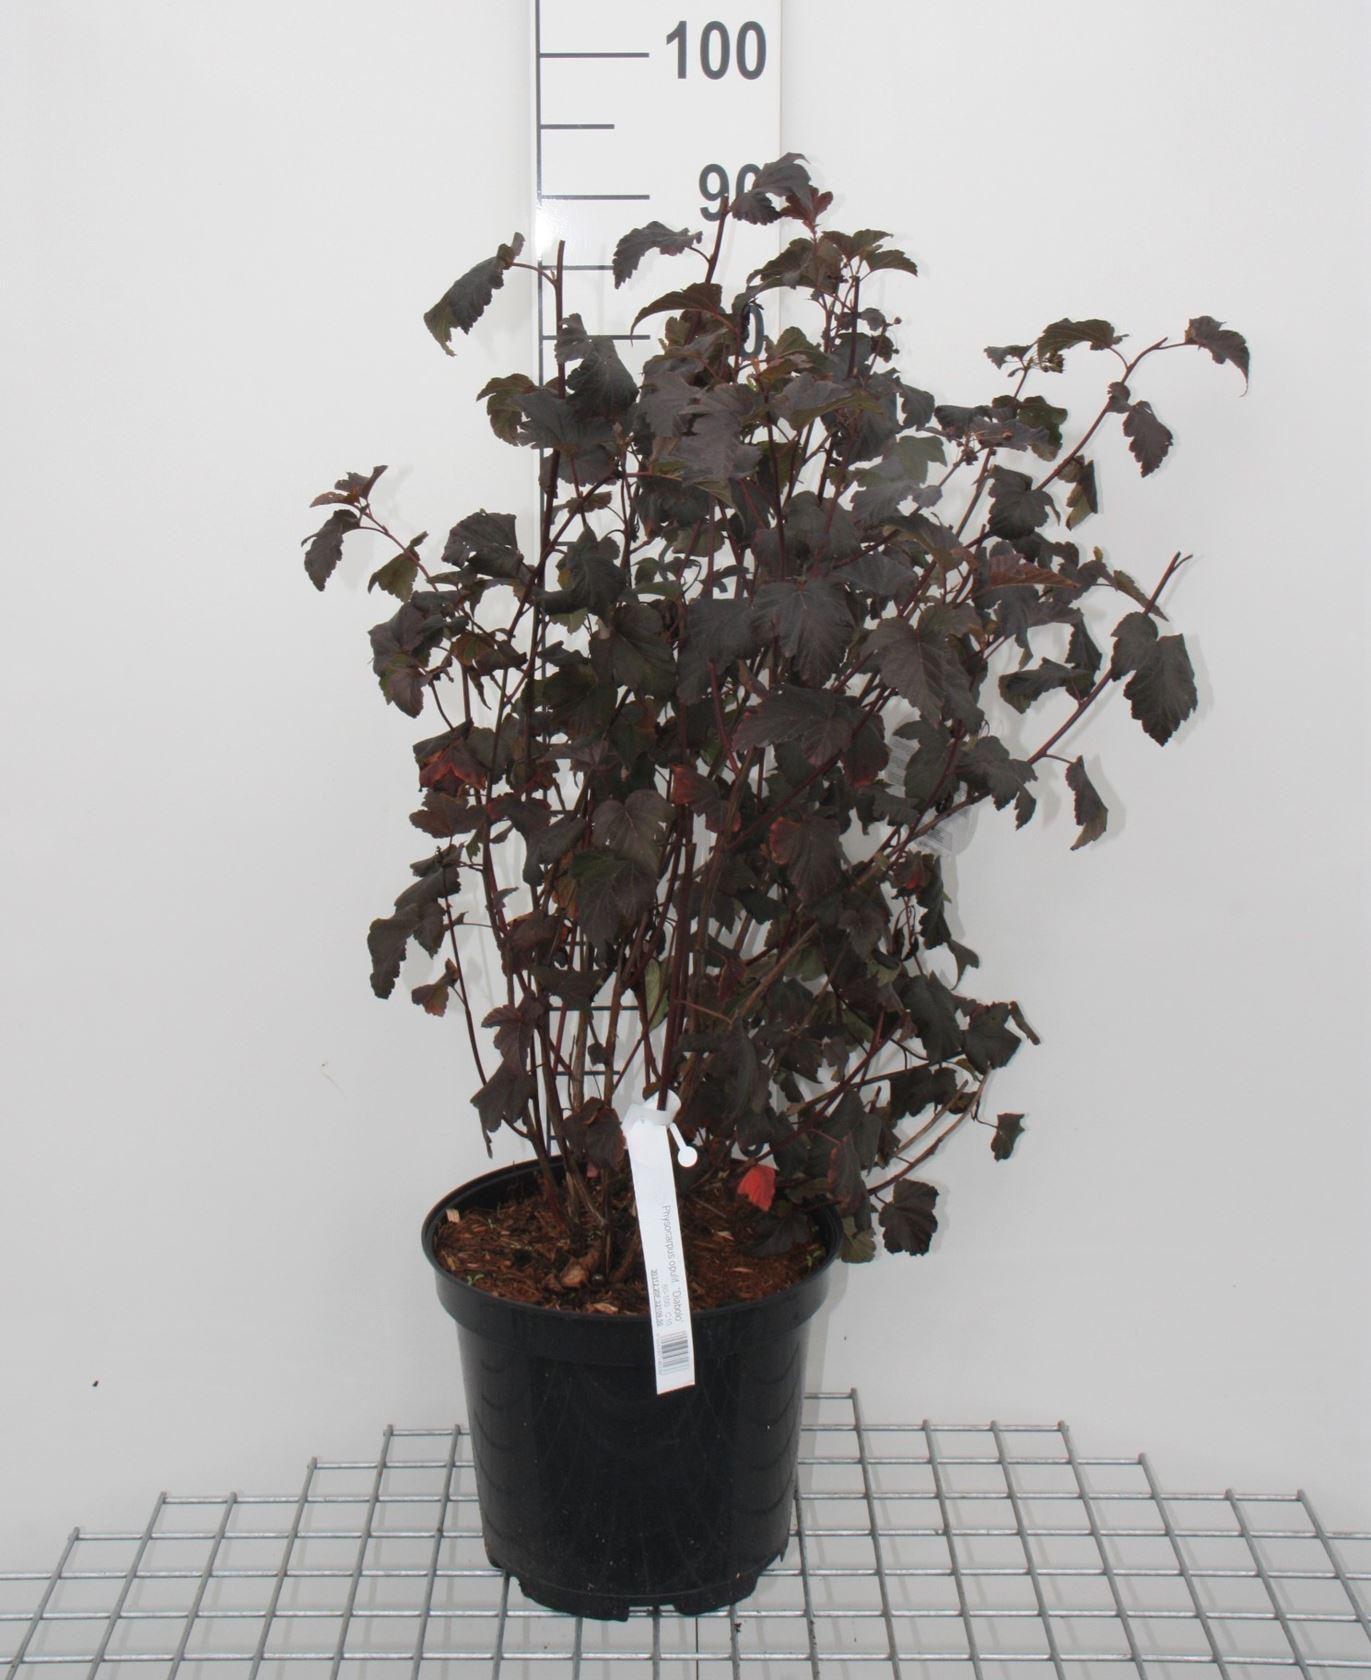 Physocarpus opulifolius 'Diabolo' 80-100 cm CO 10L